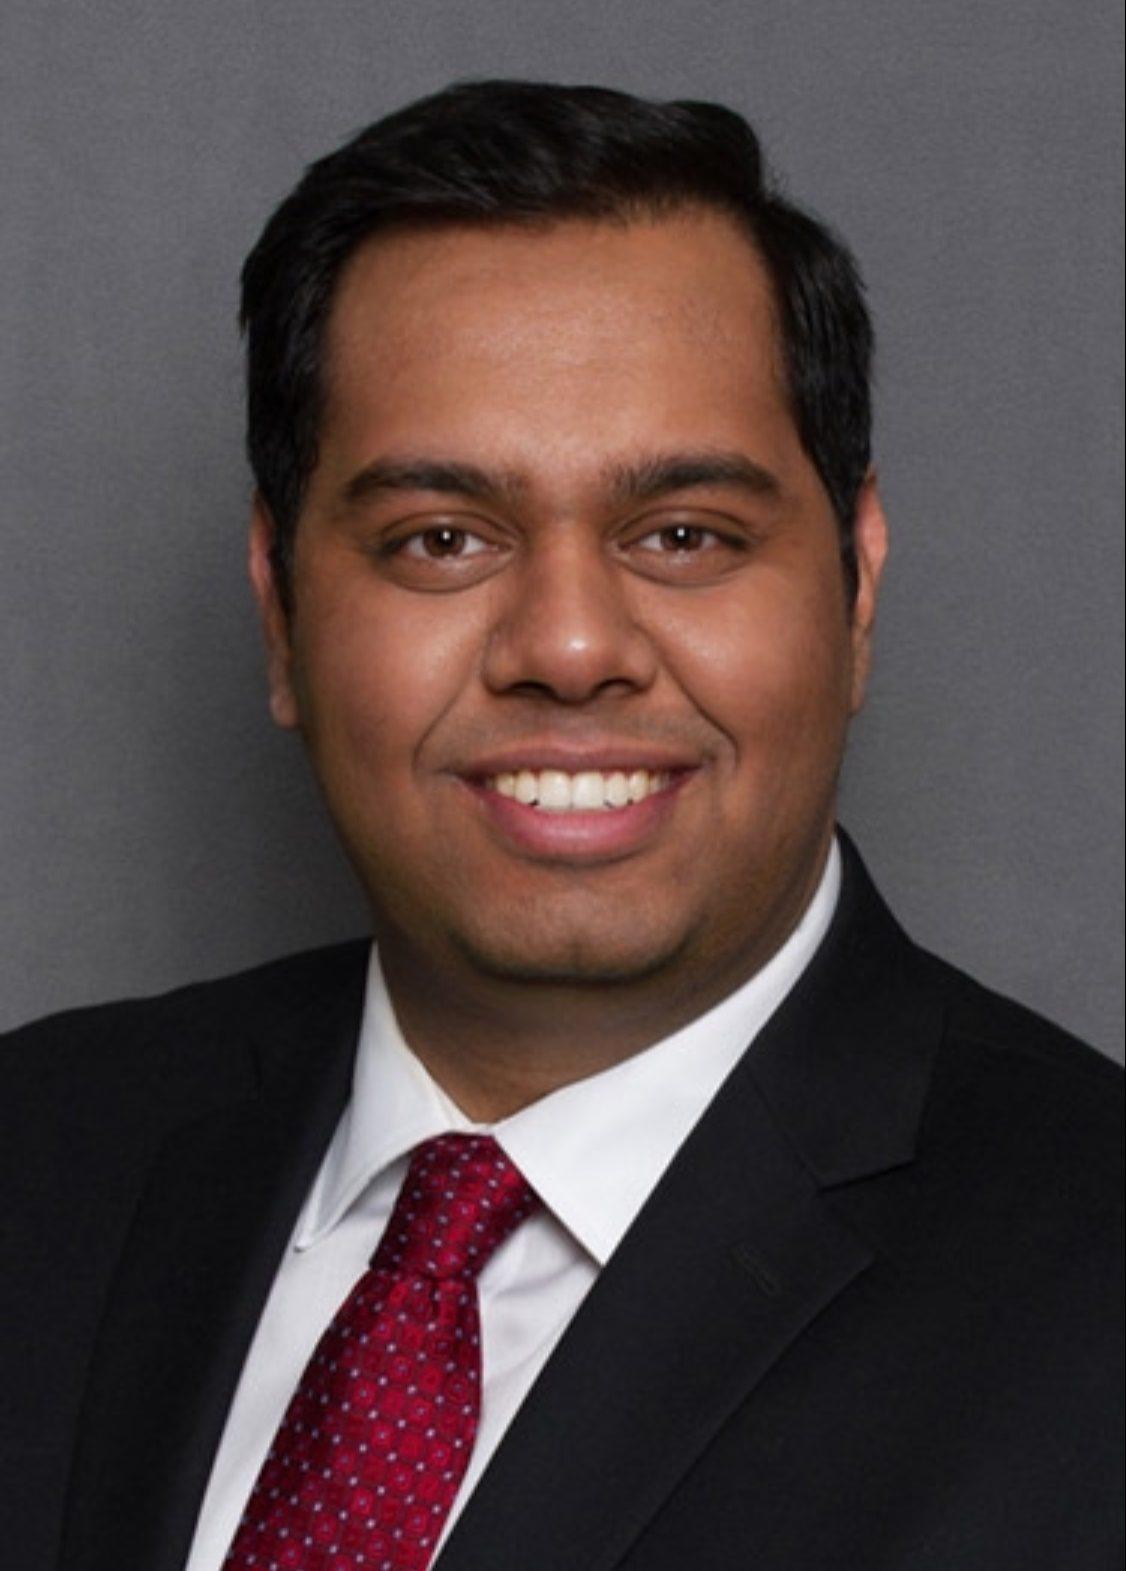 Mrinal Asopa, DO : Michigan State University College of Osteopathic Medicine